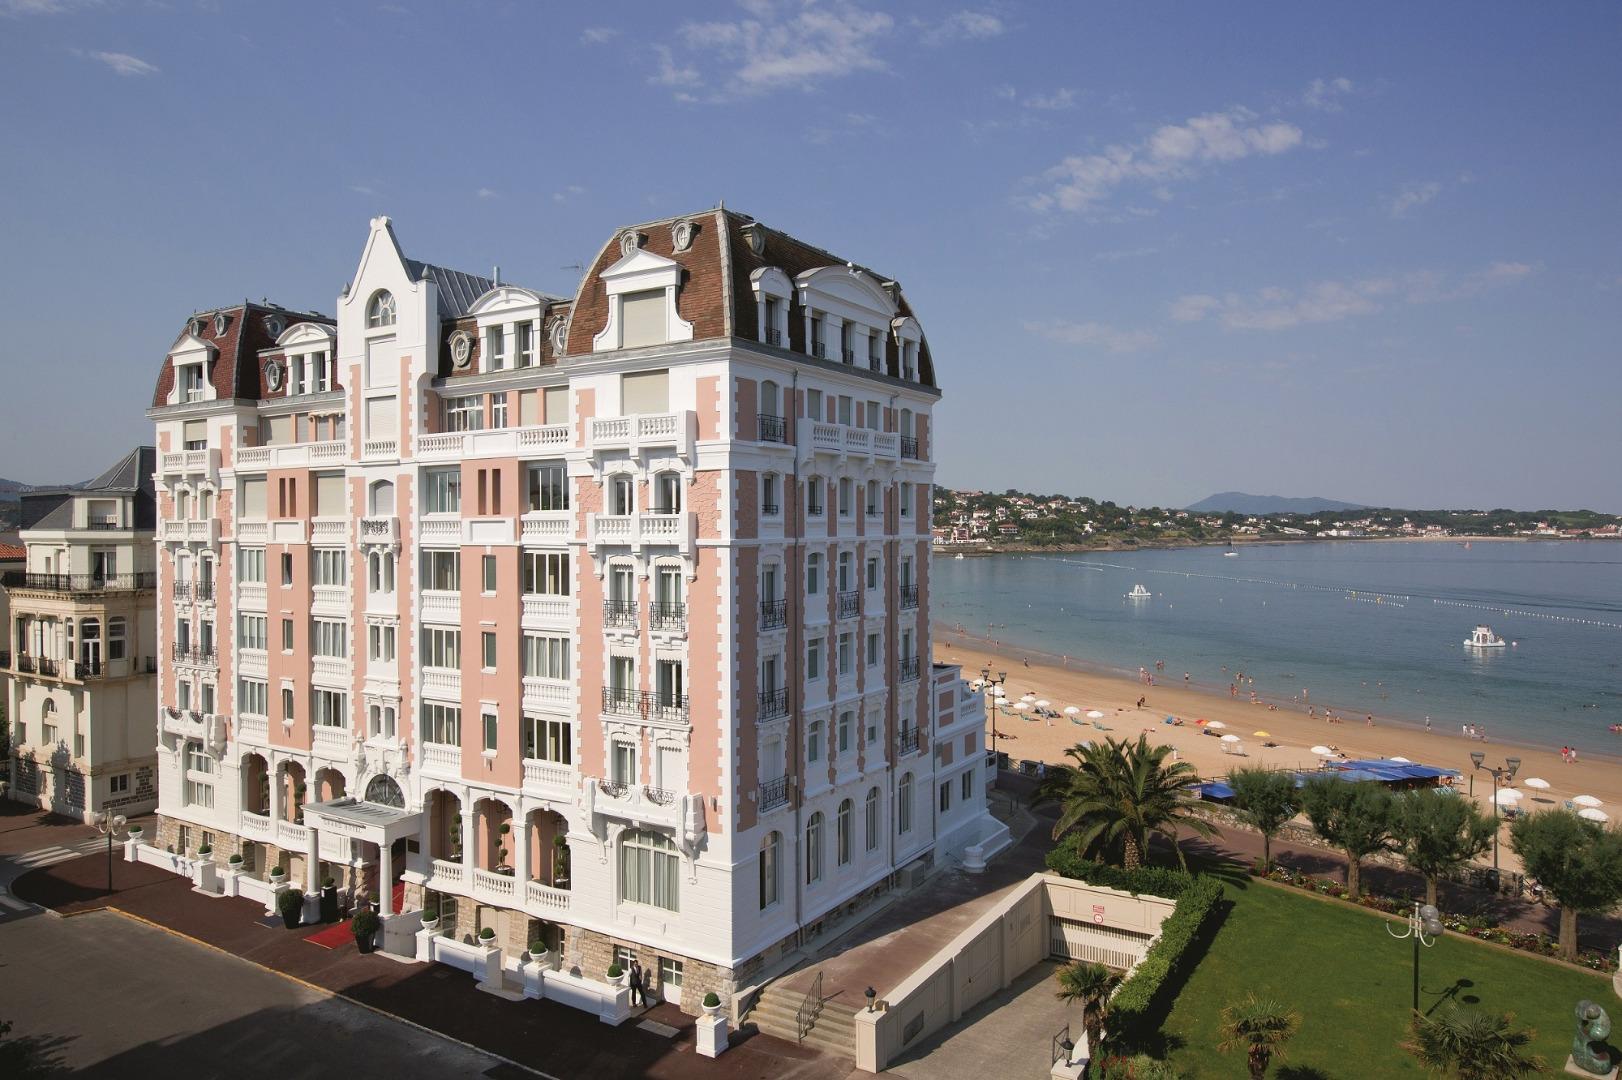 Grand Hotel Thalasso et Spa in SAINT JEAN DE LUZ